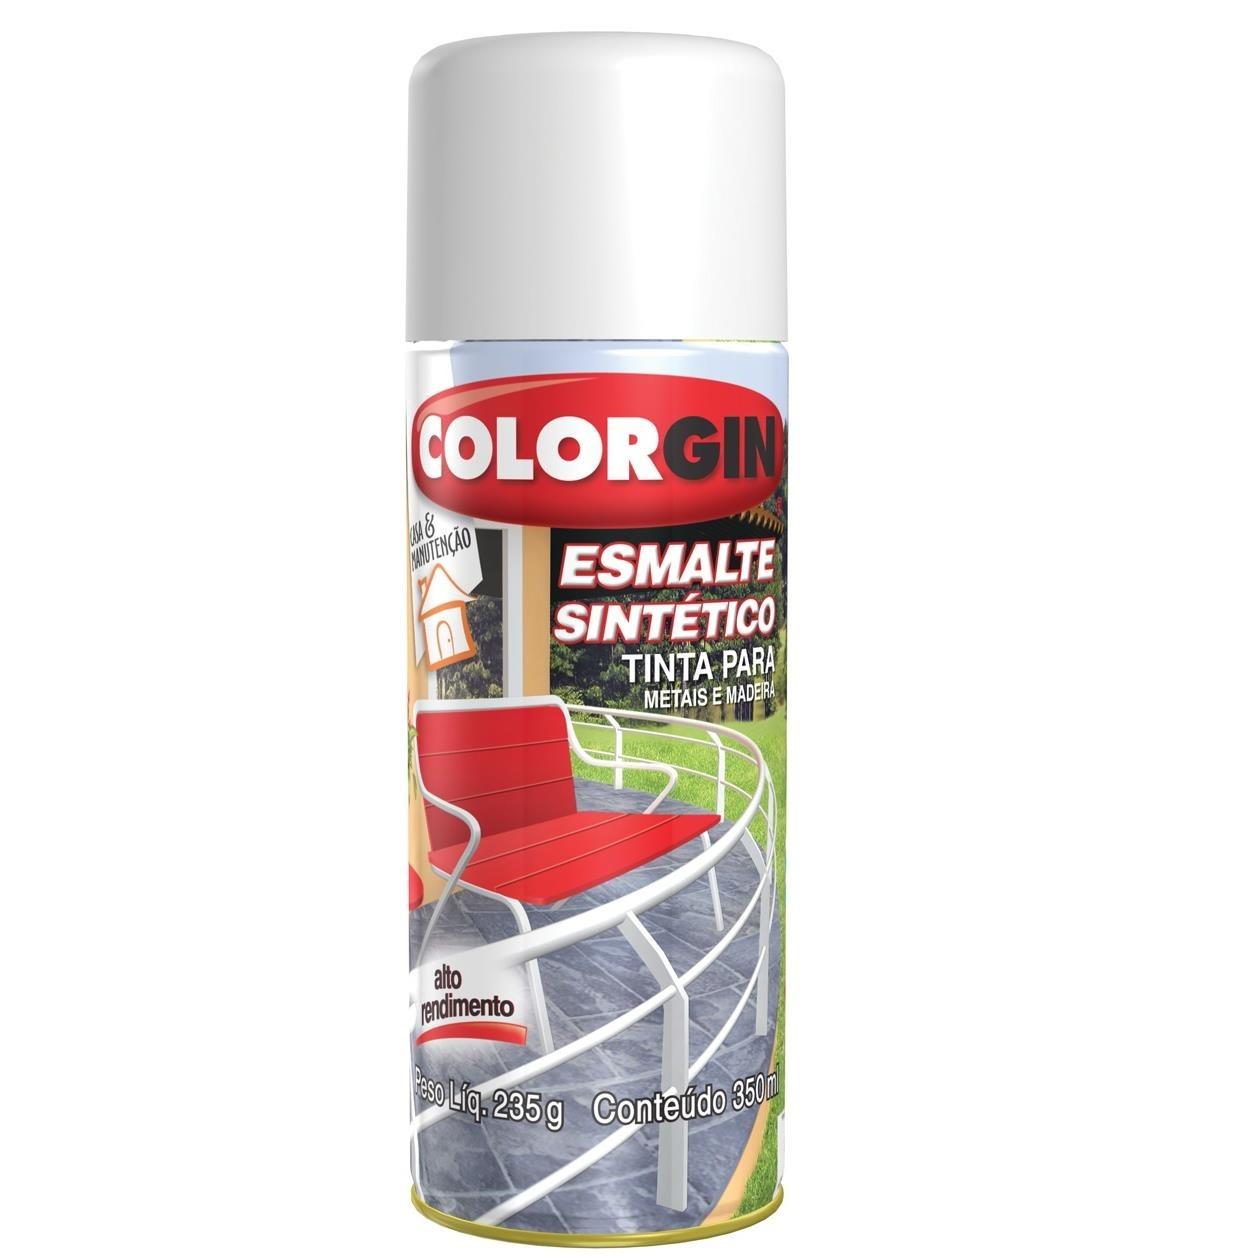 Tinta Spray Brilhante Esmalte sintetico Interno e Externo - Azul Medio - 350ml - Colorgin